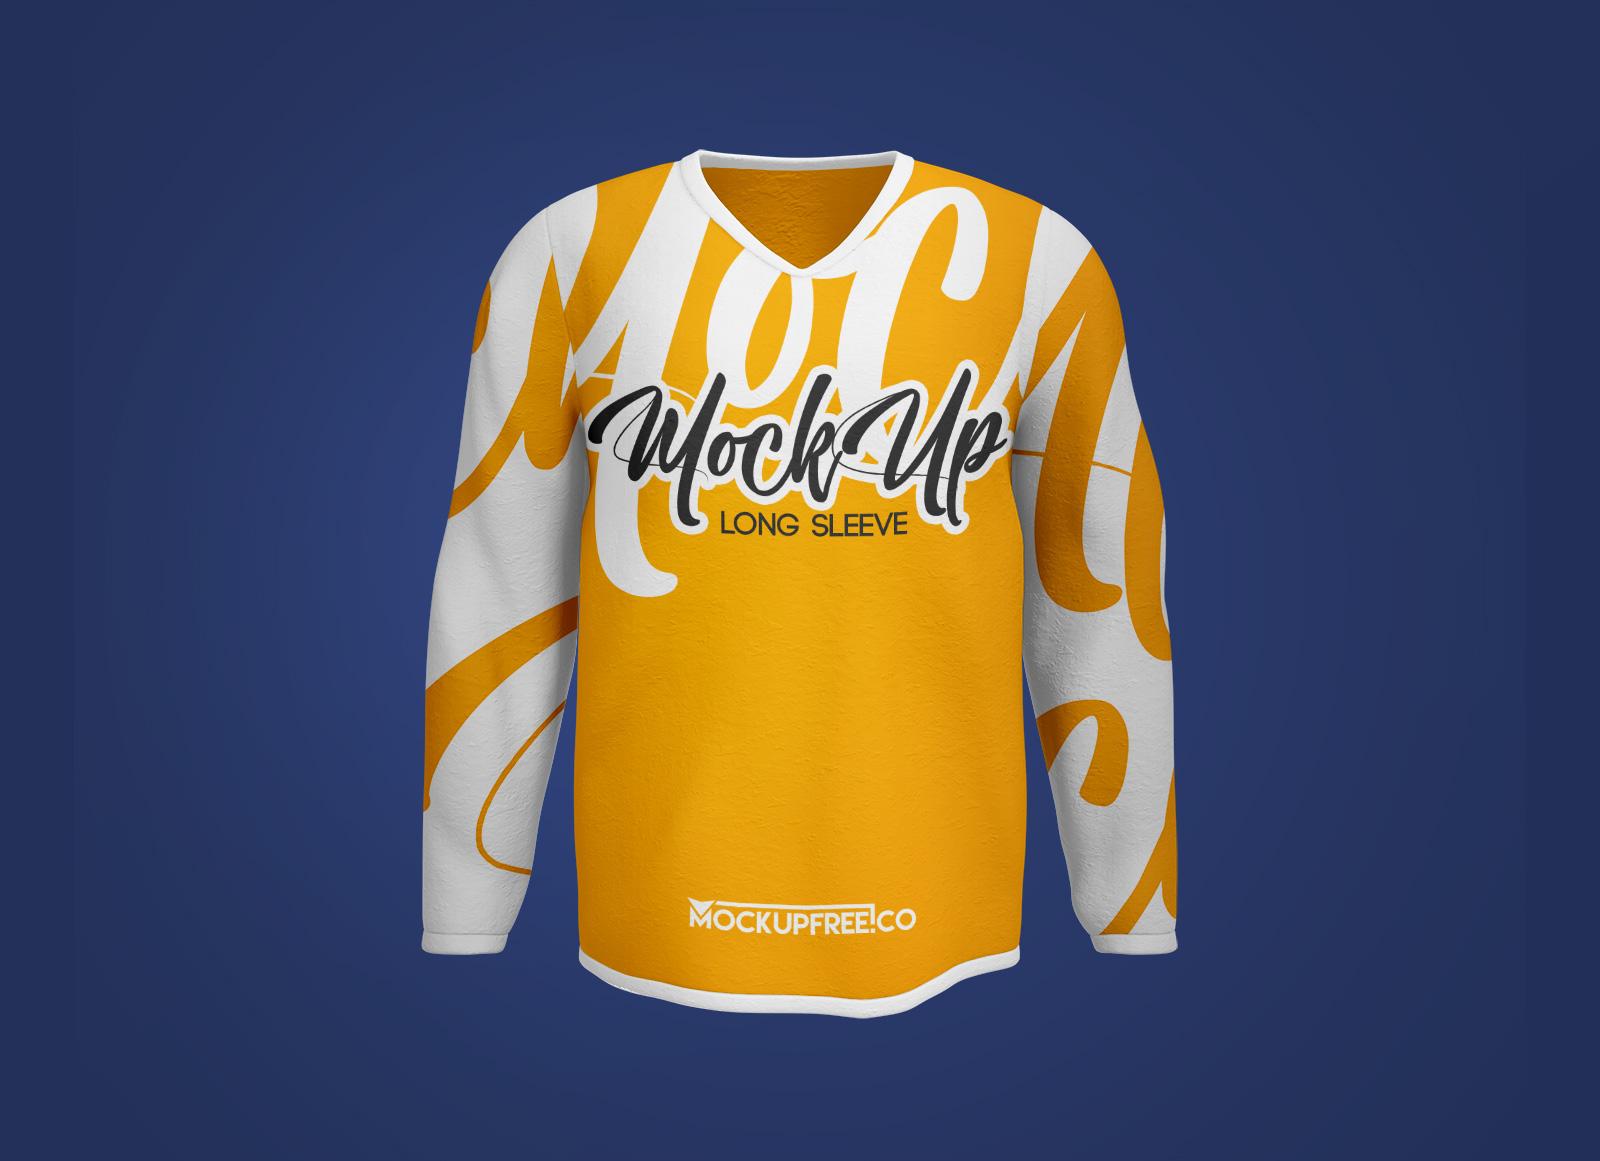 Free-V-Neck-Full-Sleeves-T-Shirt-Mockup-PSD-Set